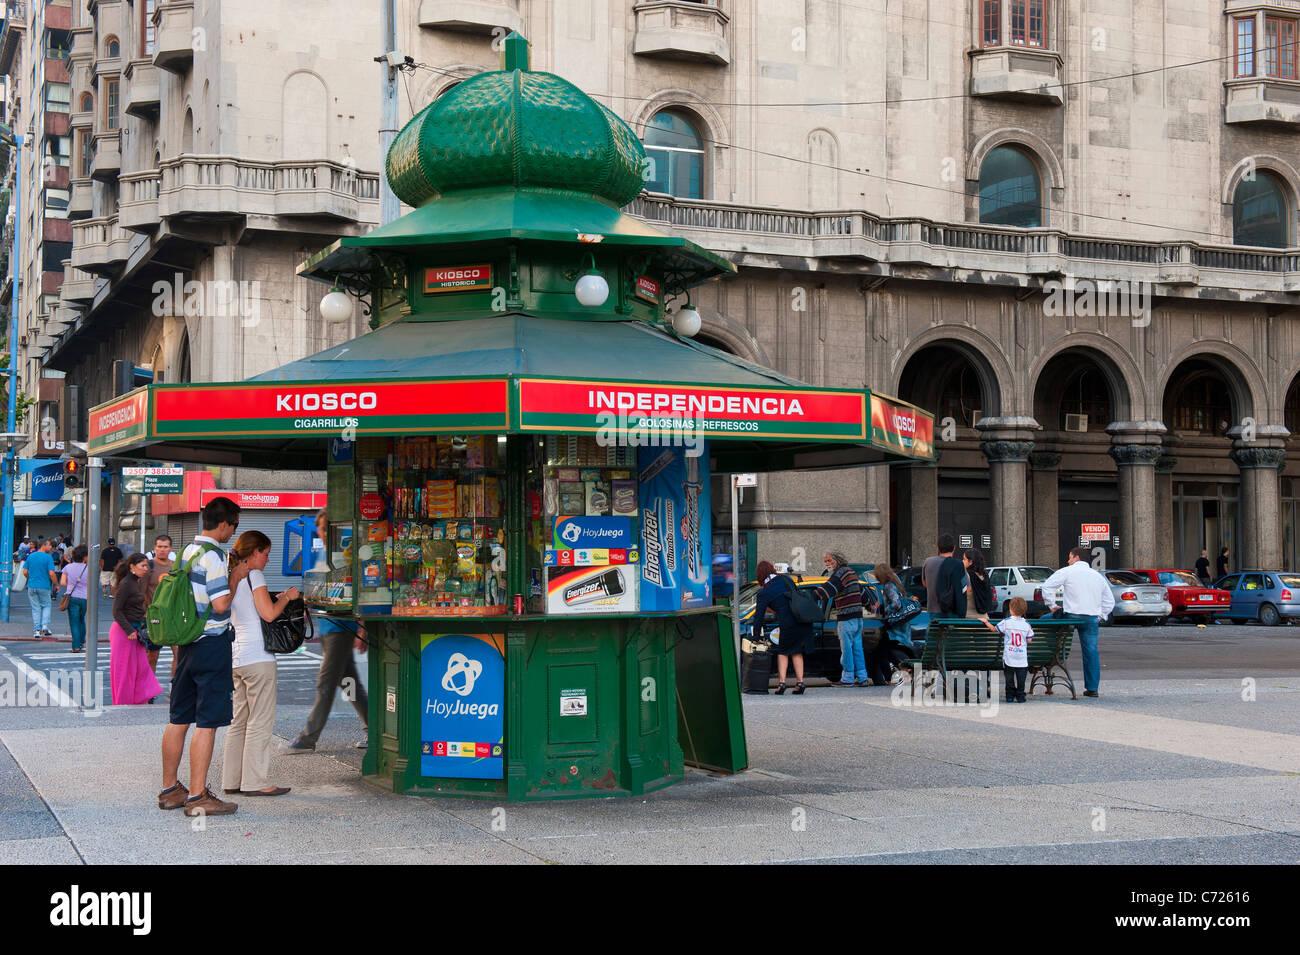 Plaza Independencia, Kiosk, Montevideo, Uruguay - Stock Image